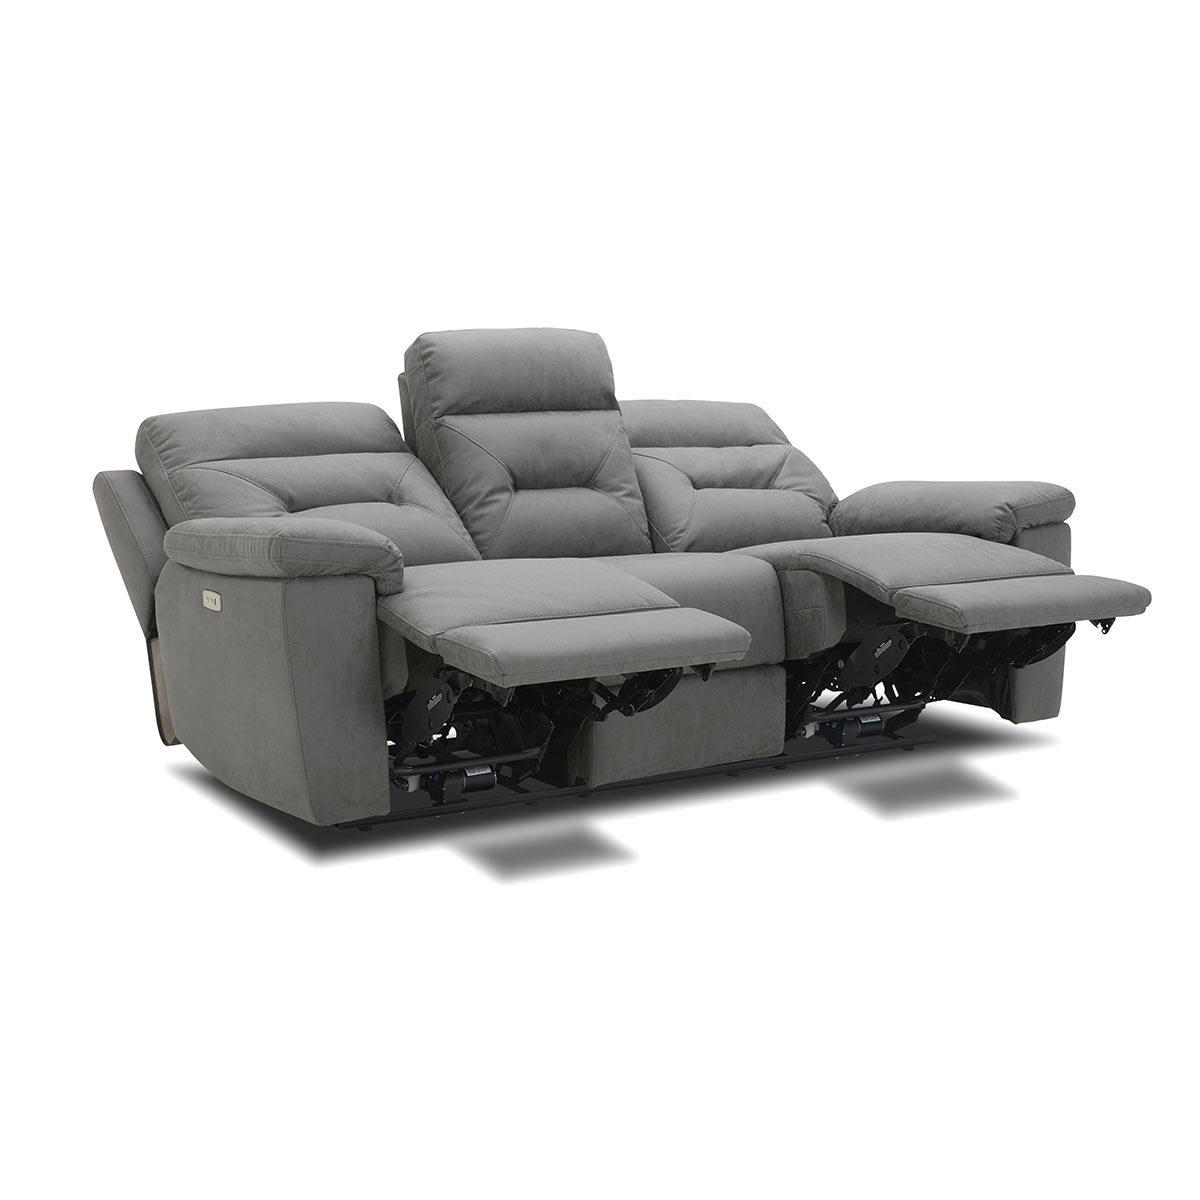 Kuka Justin Grey Fabric Power Reclining 3 Seater Sofa Pertaining To Raven Power Reclining Sofas (View 3 of 15)